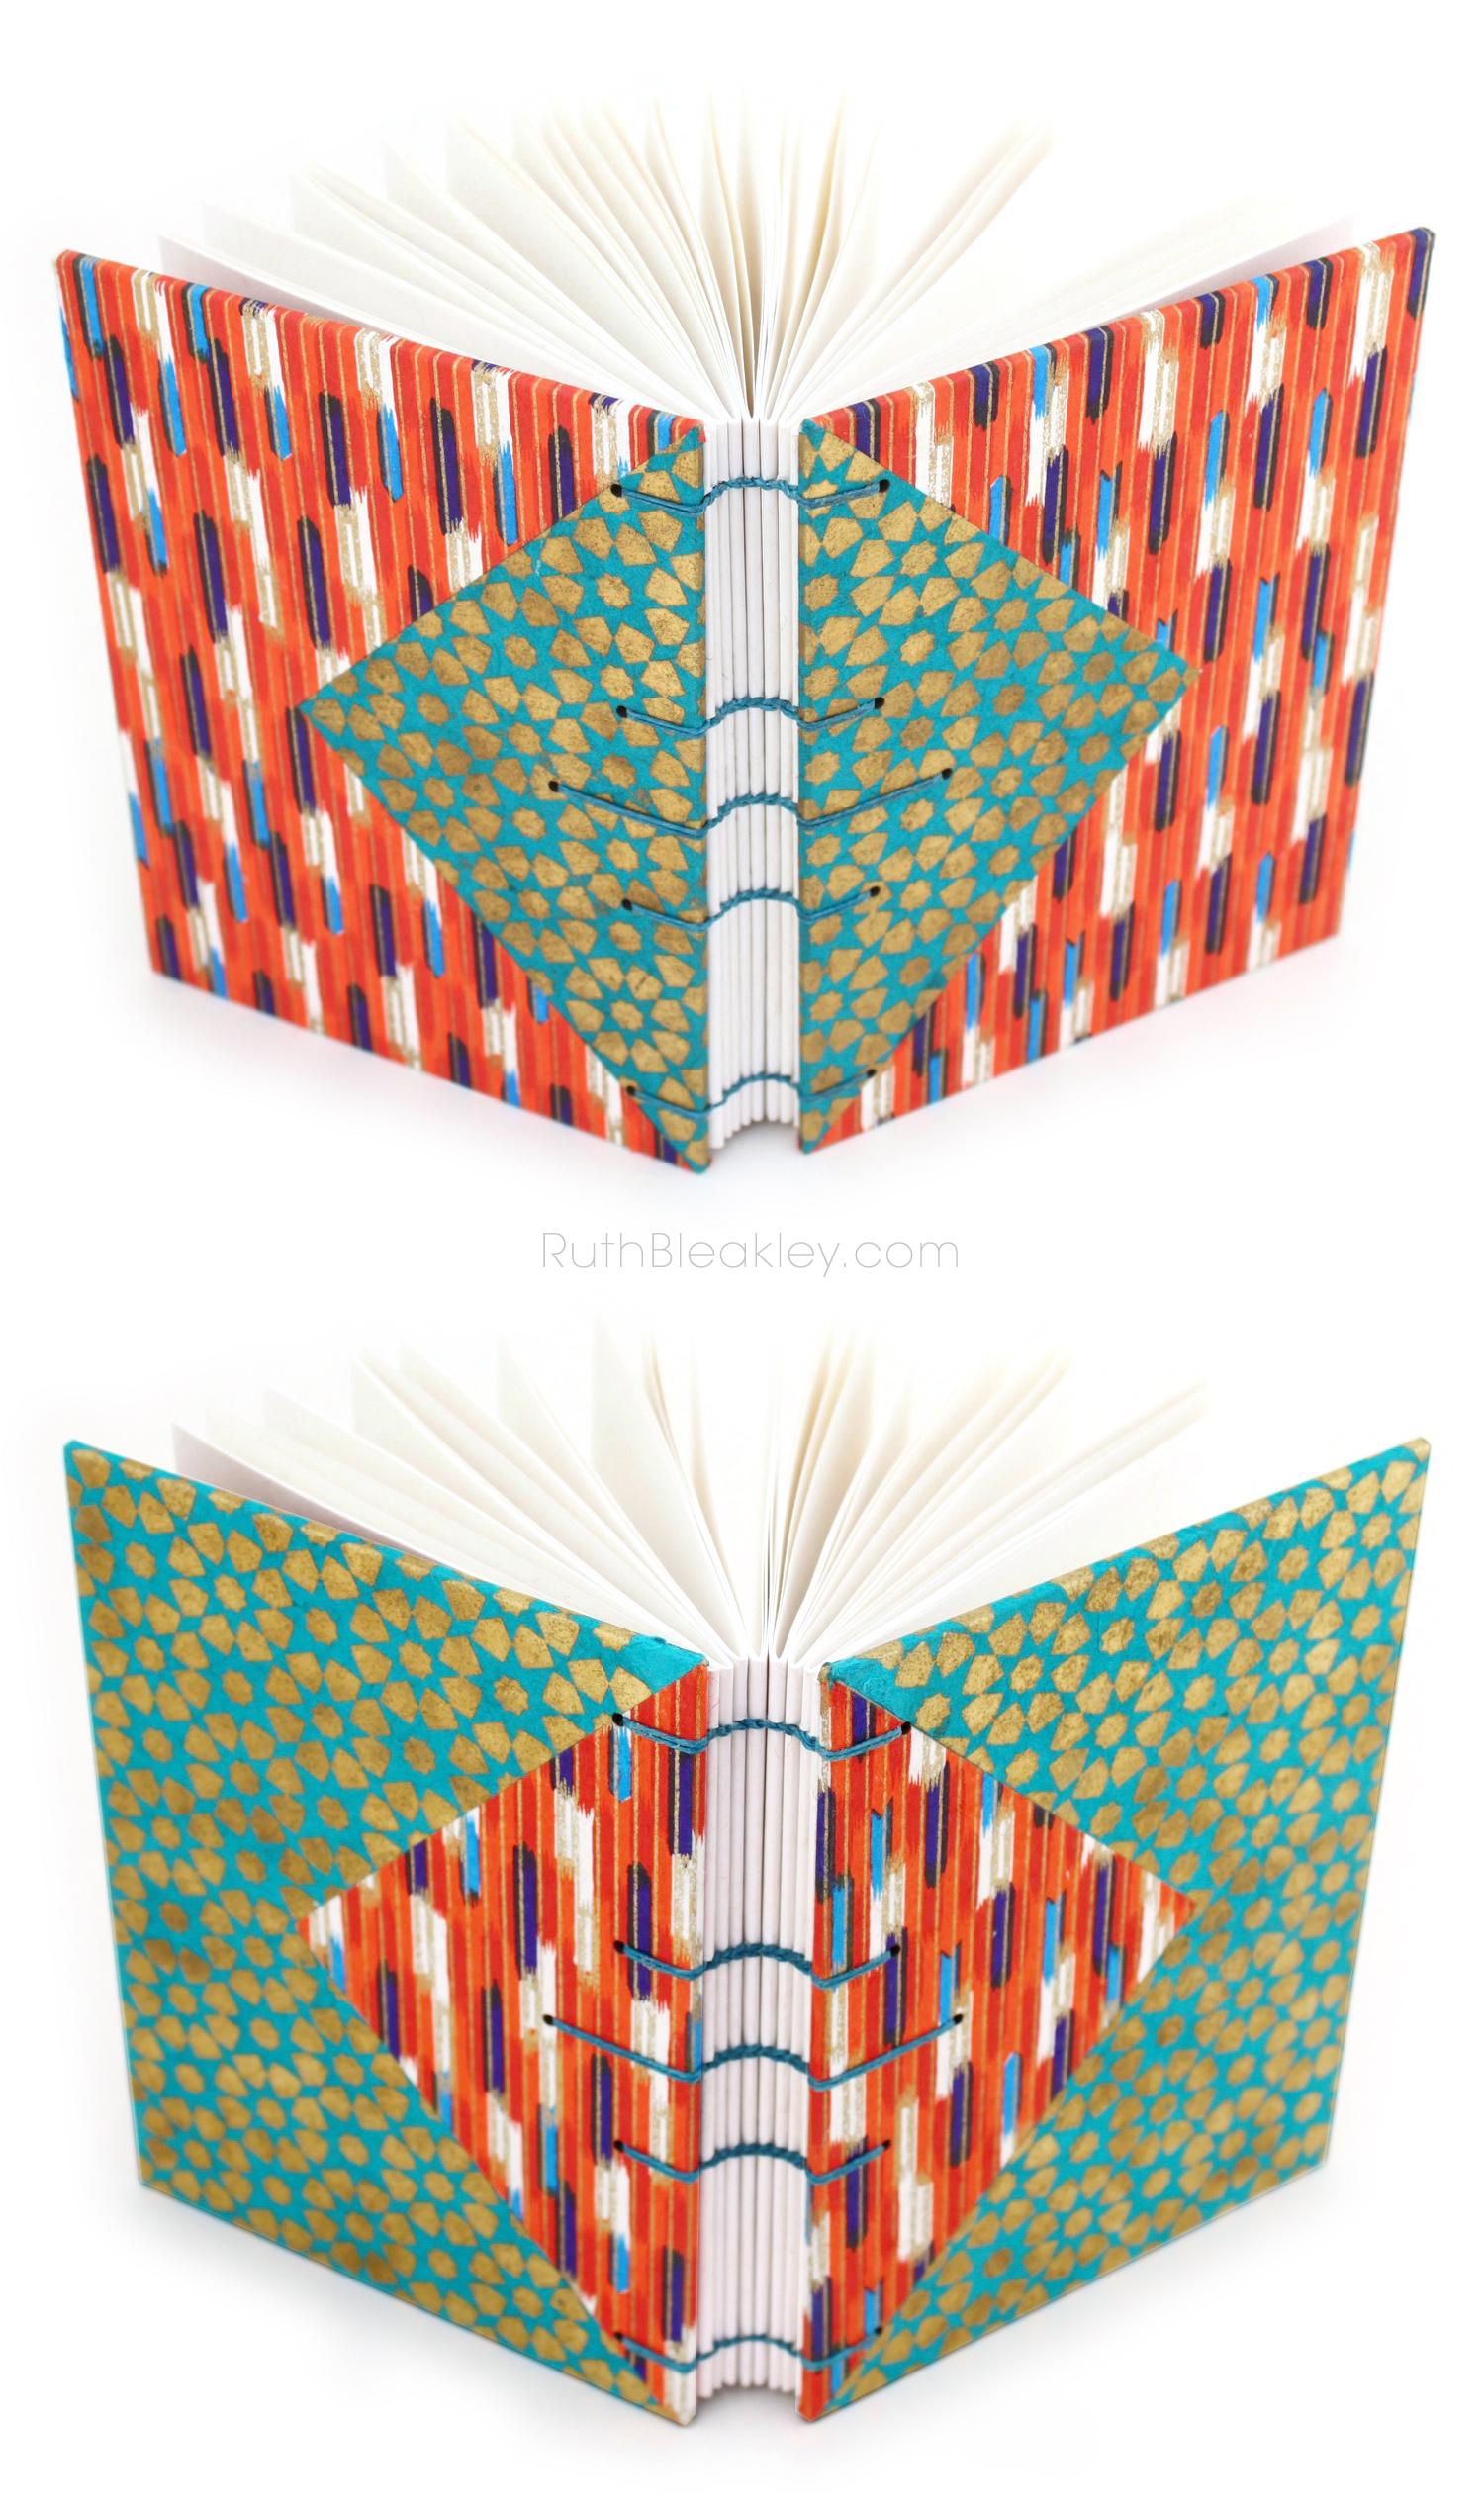 Aqua and Orange Twin Journals handmade by Ruth Bleakley